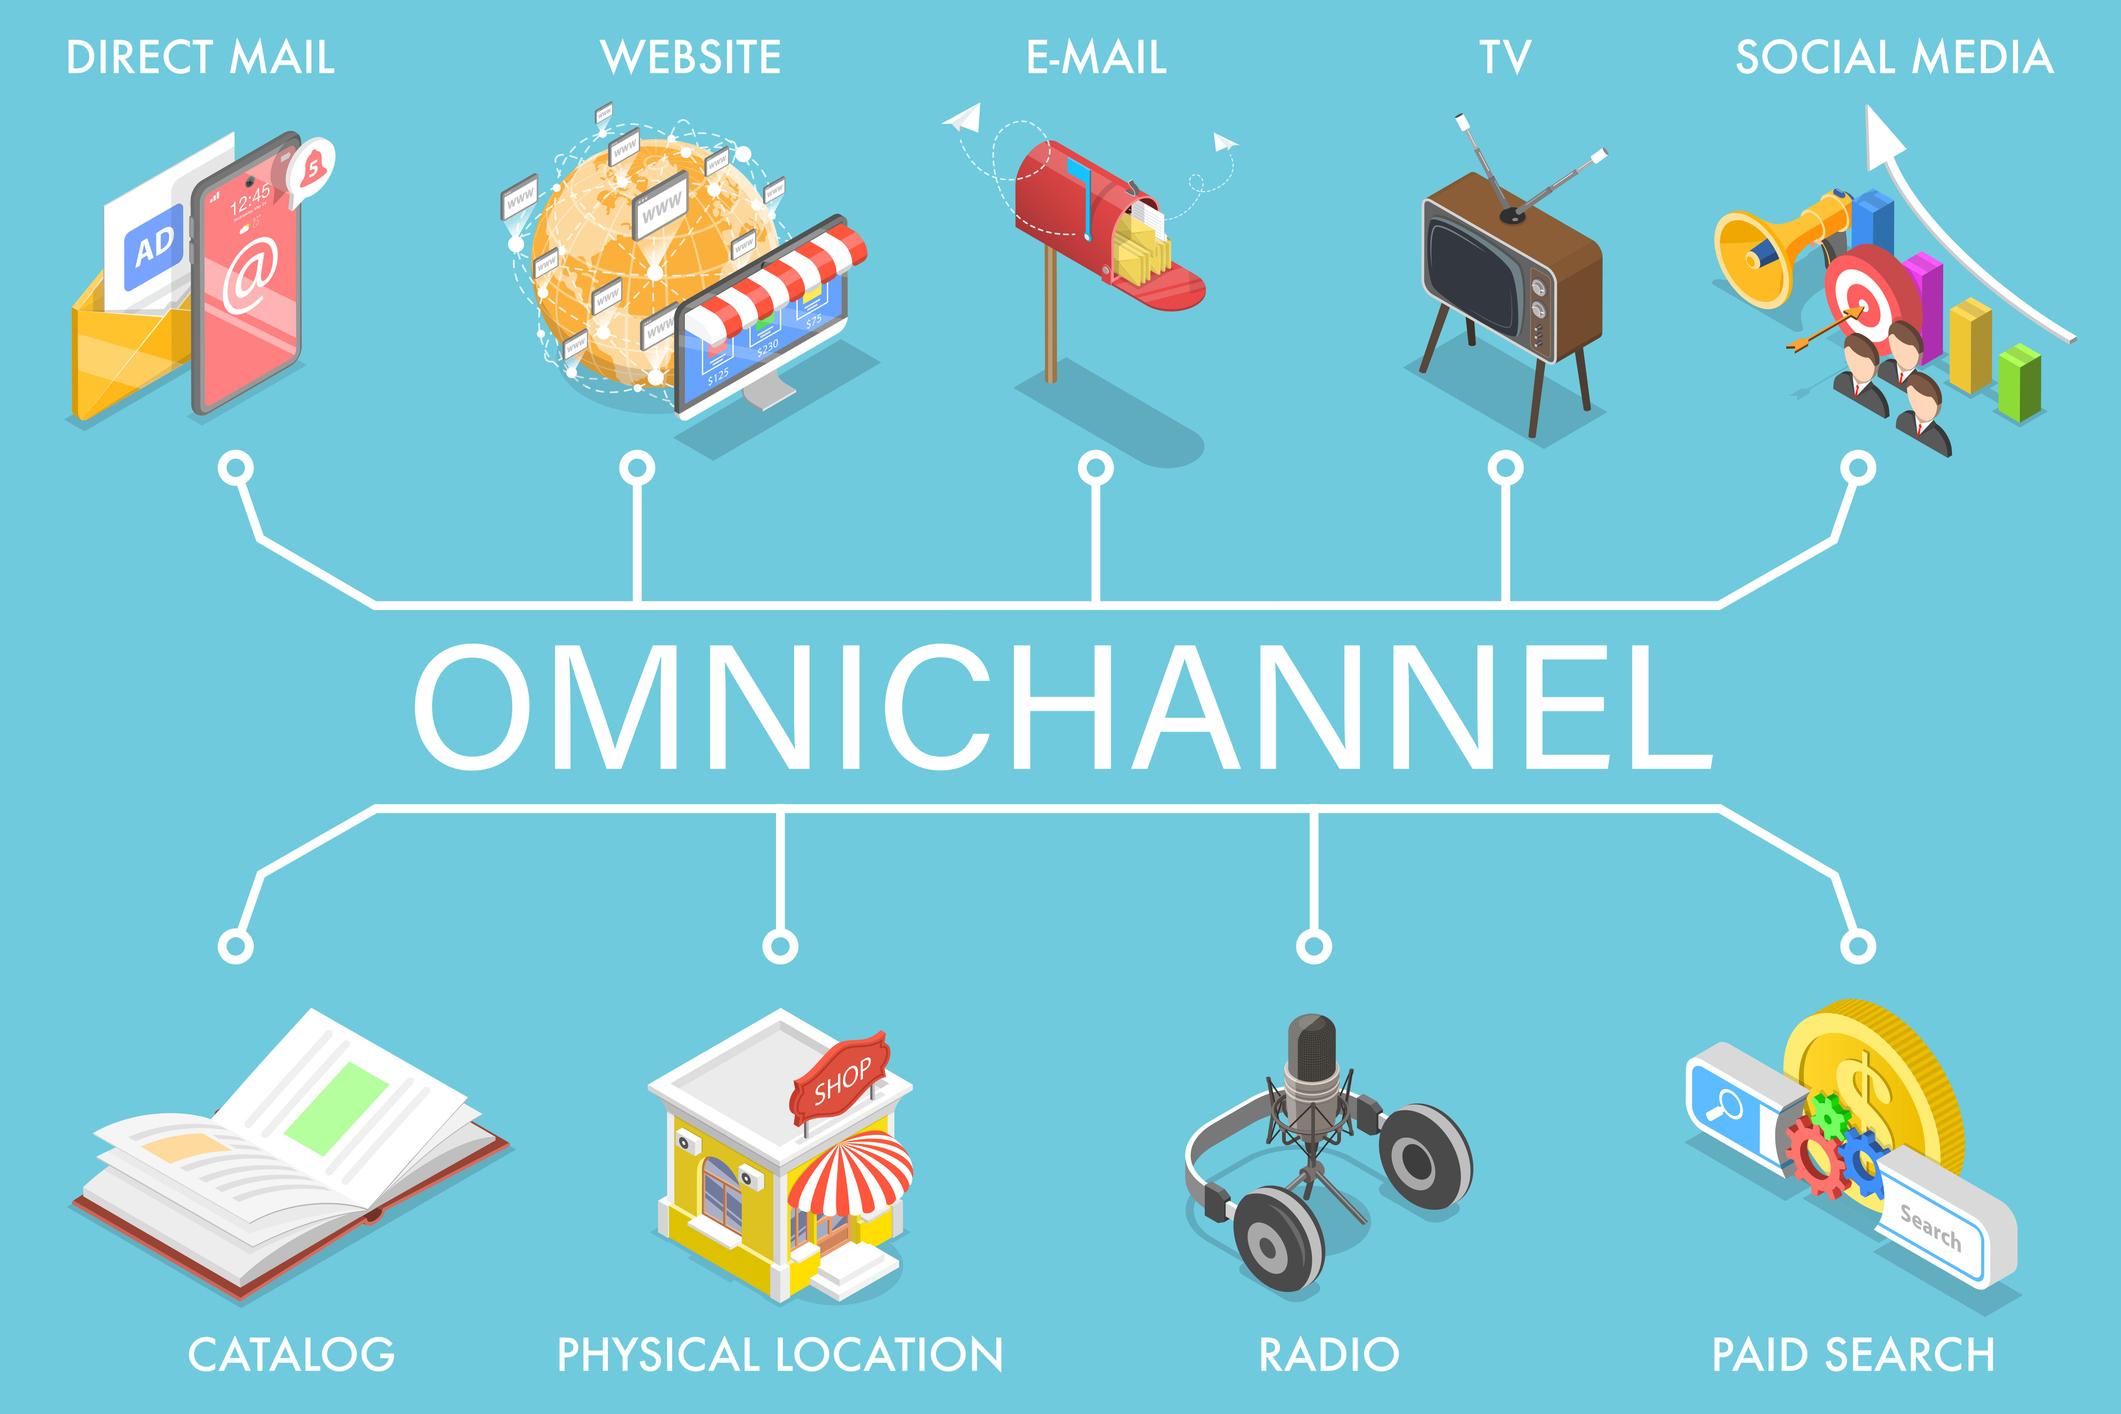 Omnichannel marketing tactics